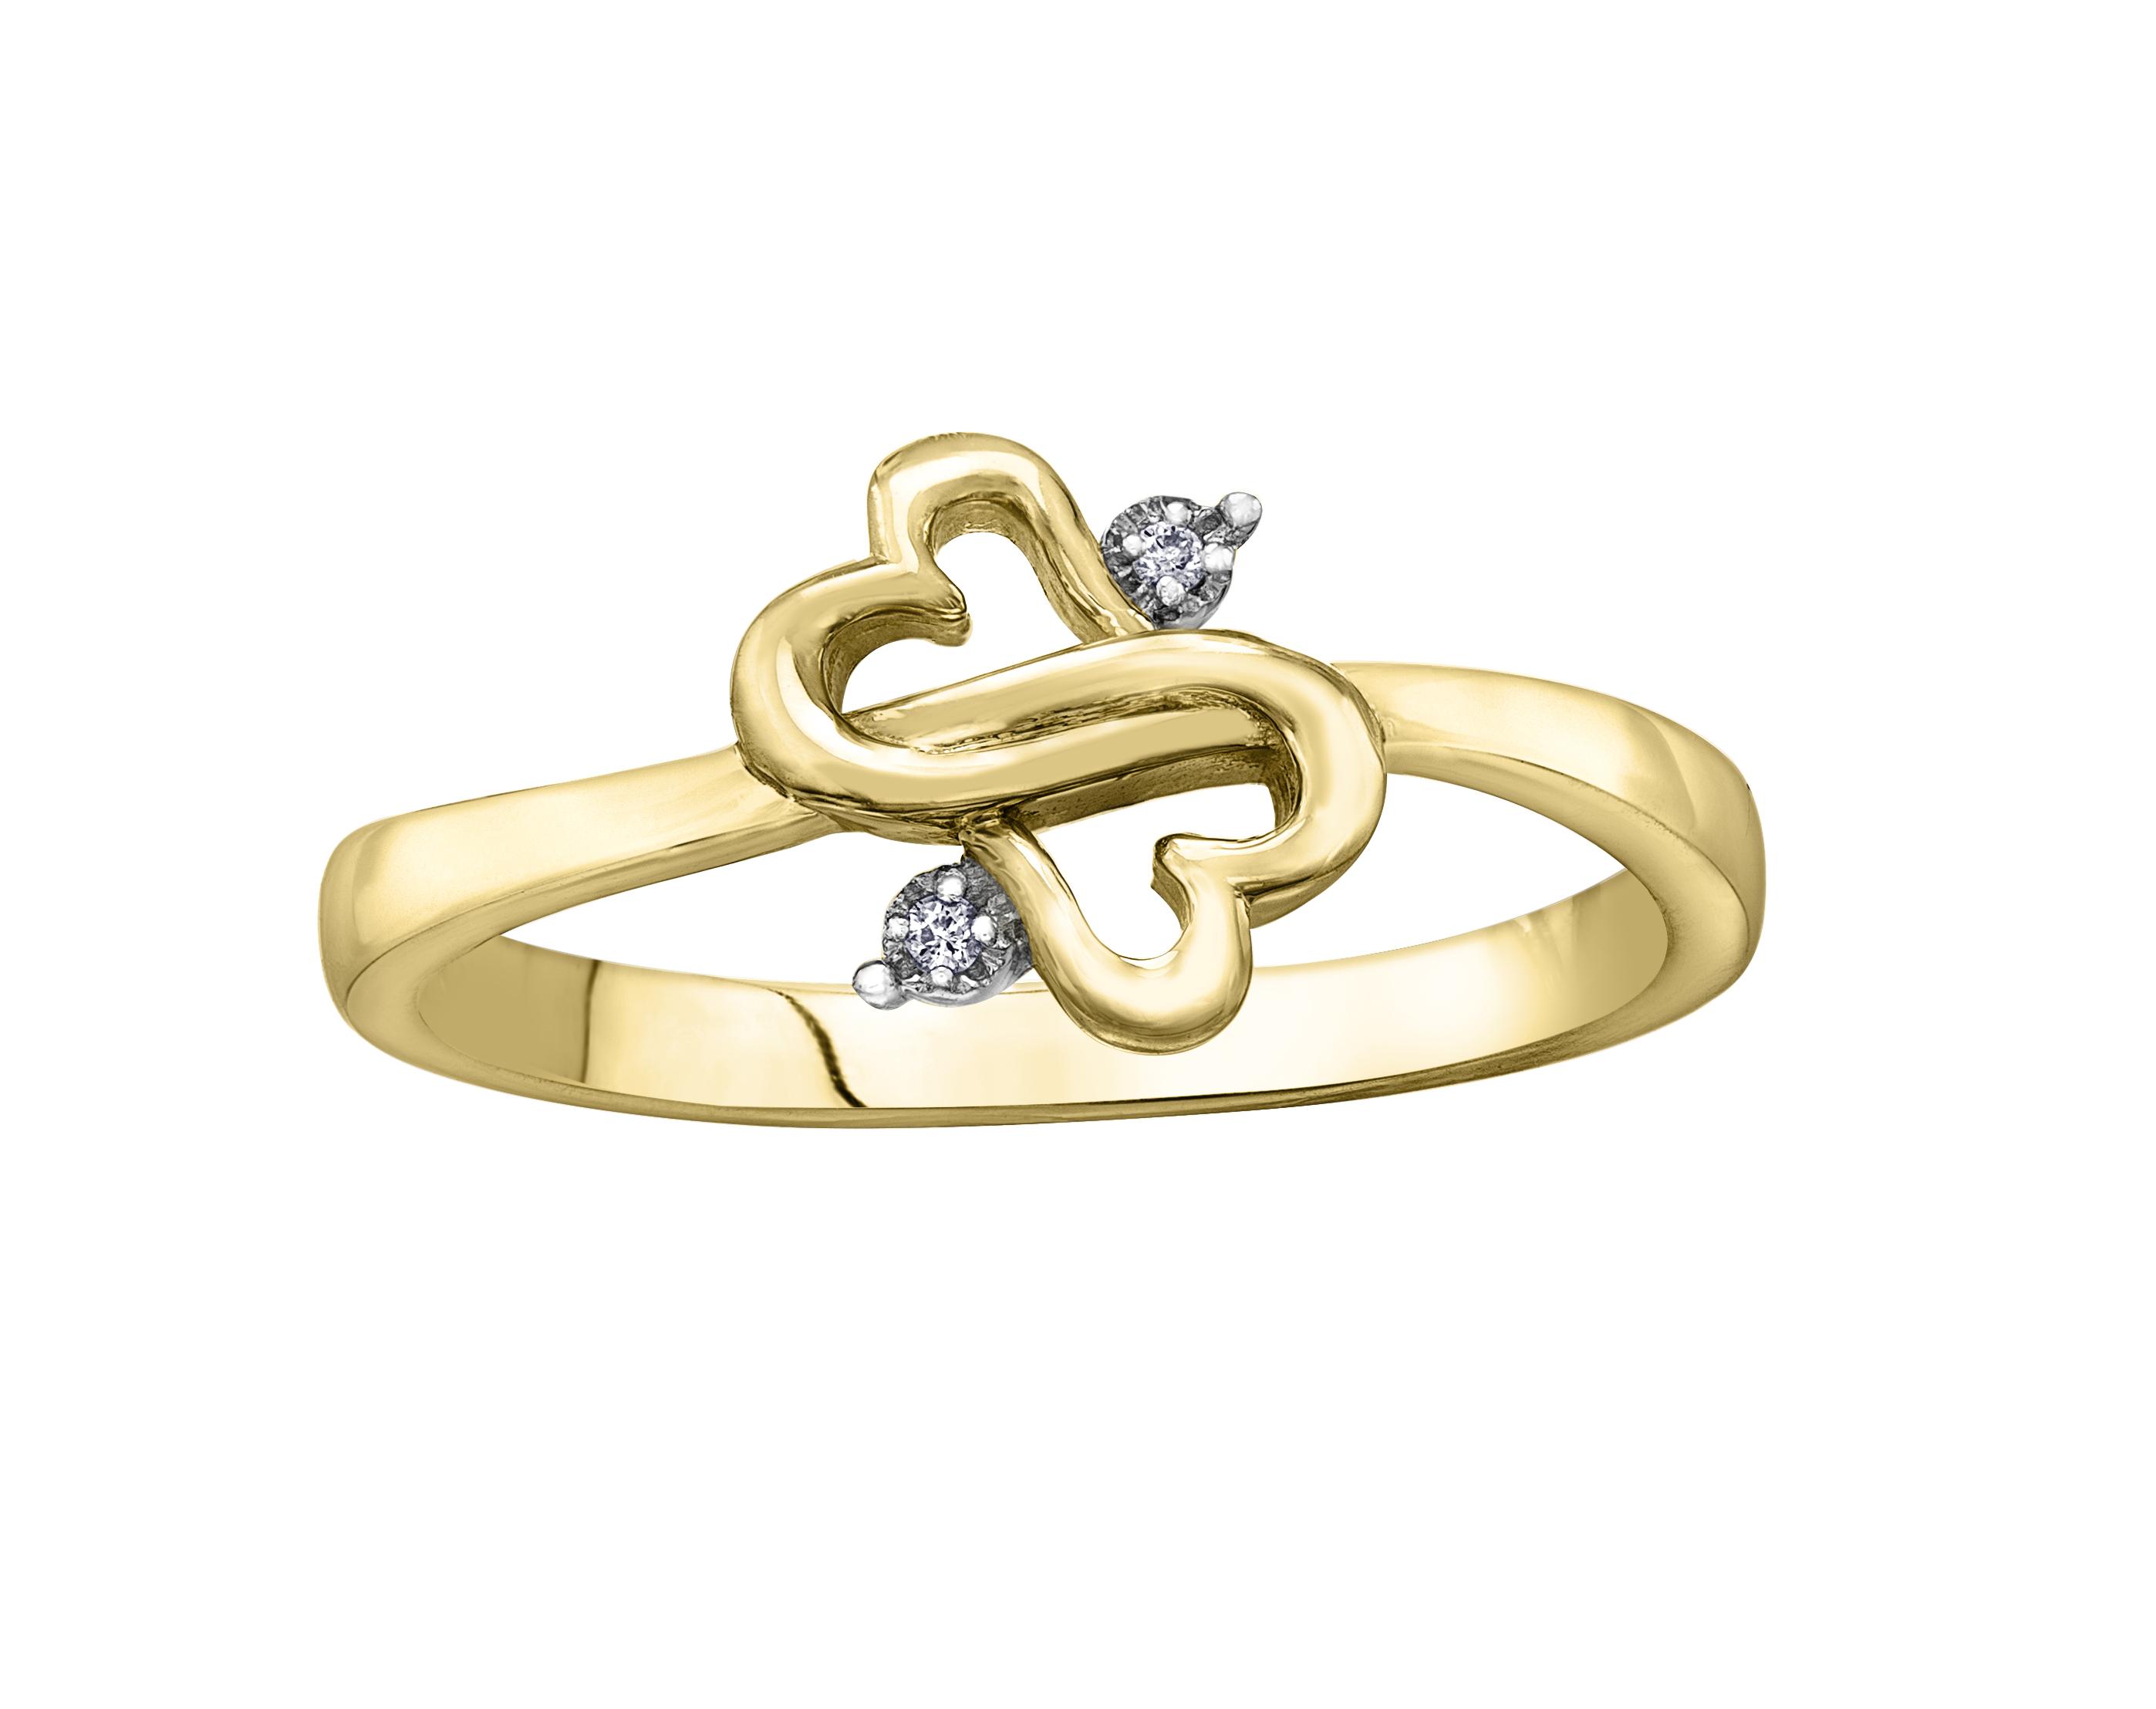 Heart ring - 10K yellow gold & Diamonds